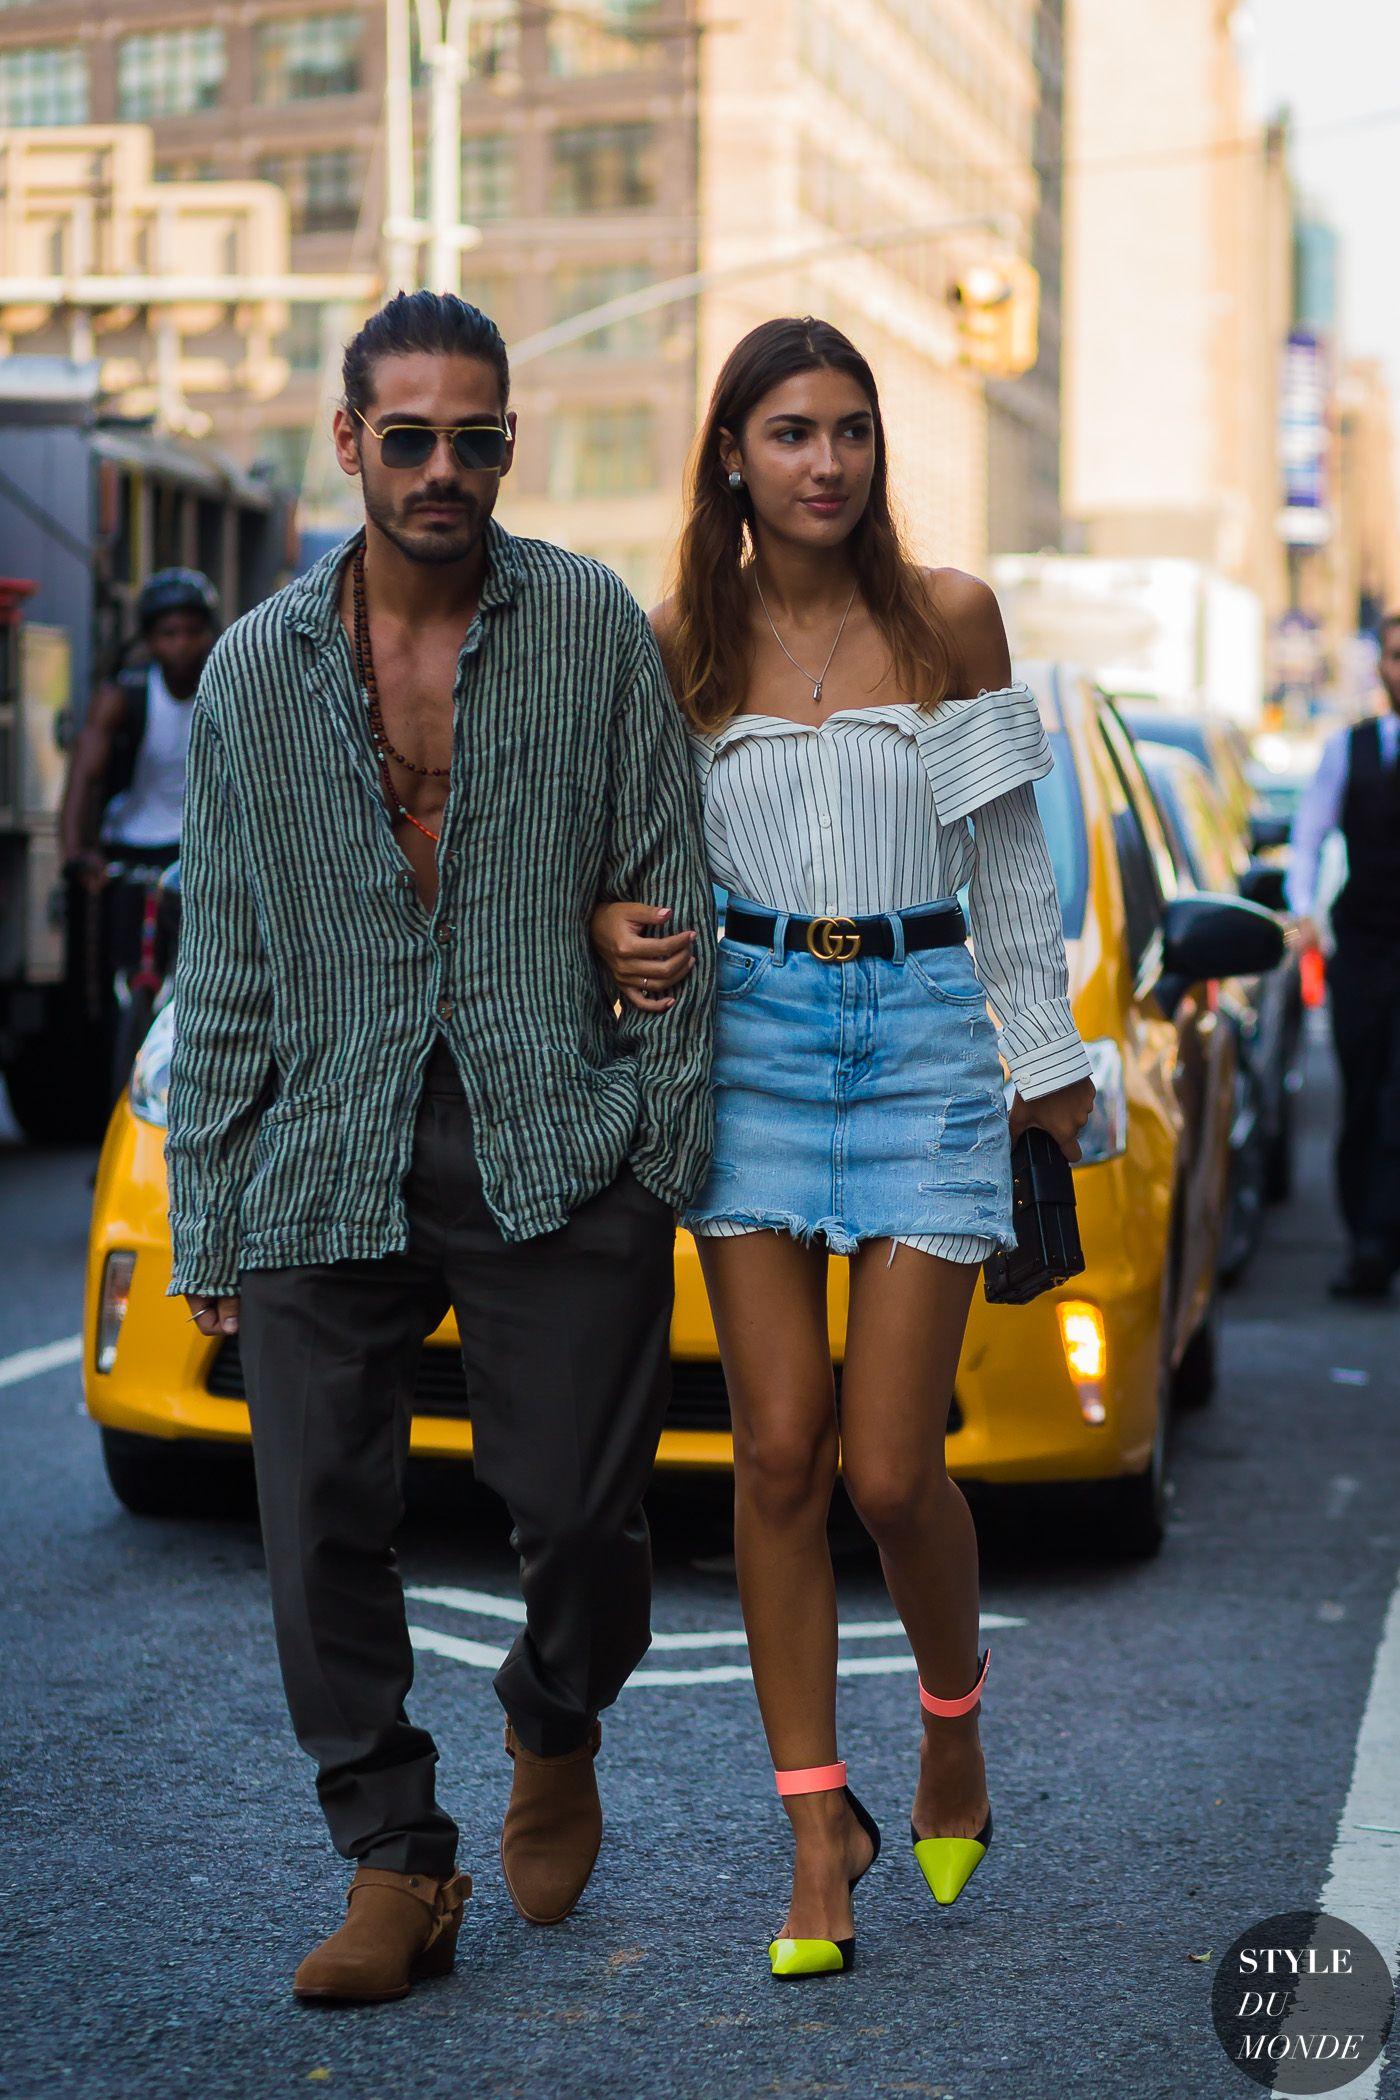 eb7265c019ab2 Patricia Manfield Giotto Calendoli by STYLEDUMONDE Street Style Fashion  Photography